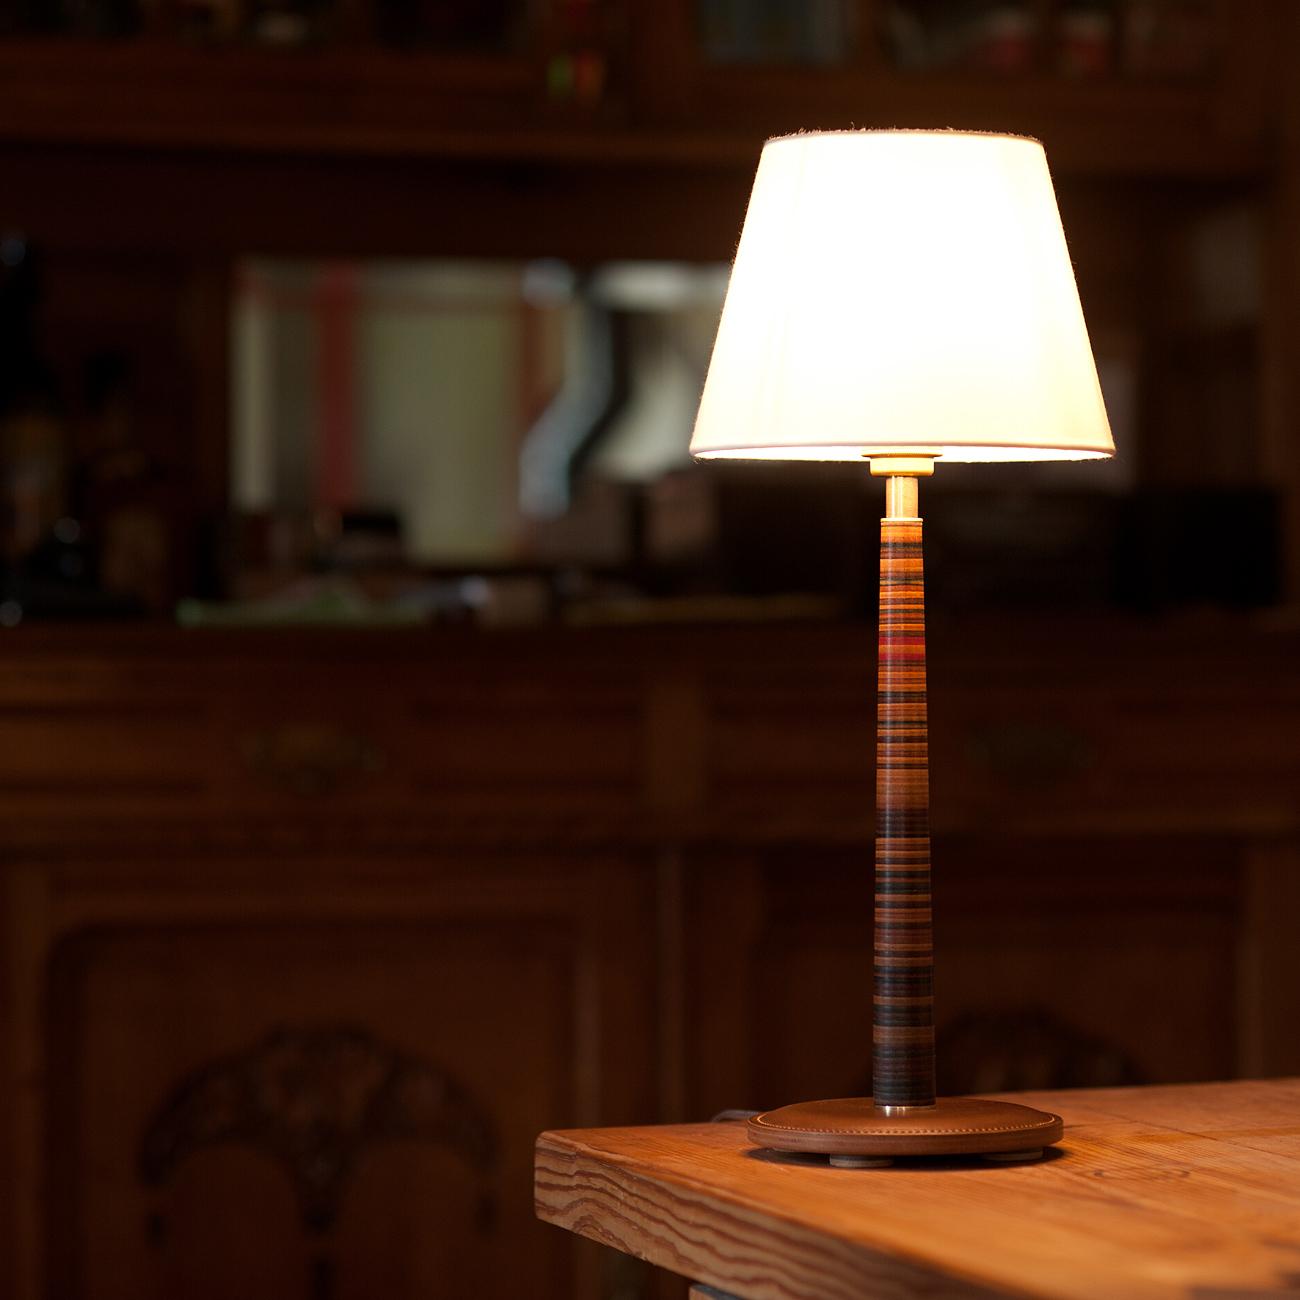 lampe_table02_img02_HD